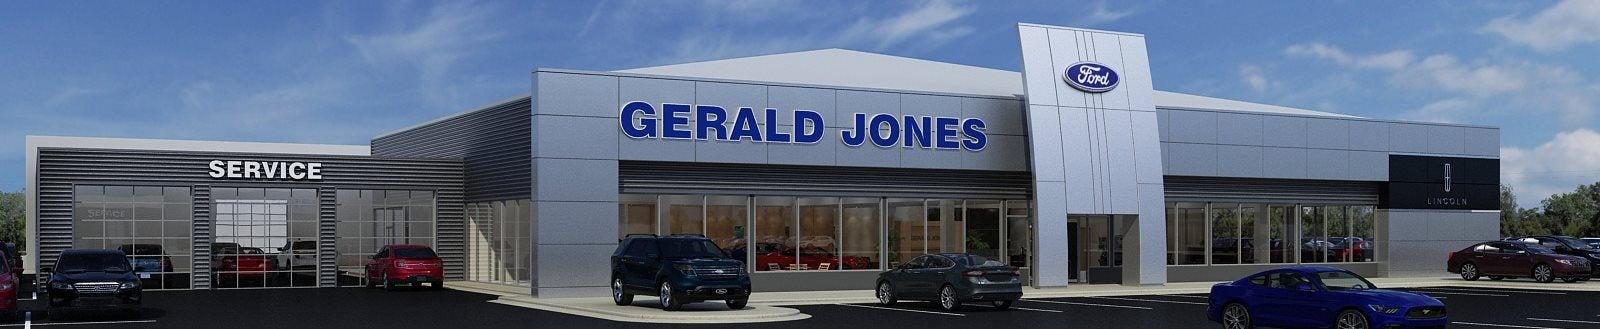 Gerald Jones Ford >> Gerald Jones Ford Sitemap Augusta Ga